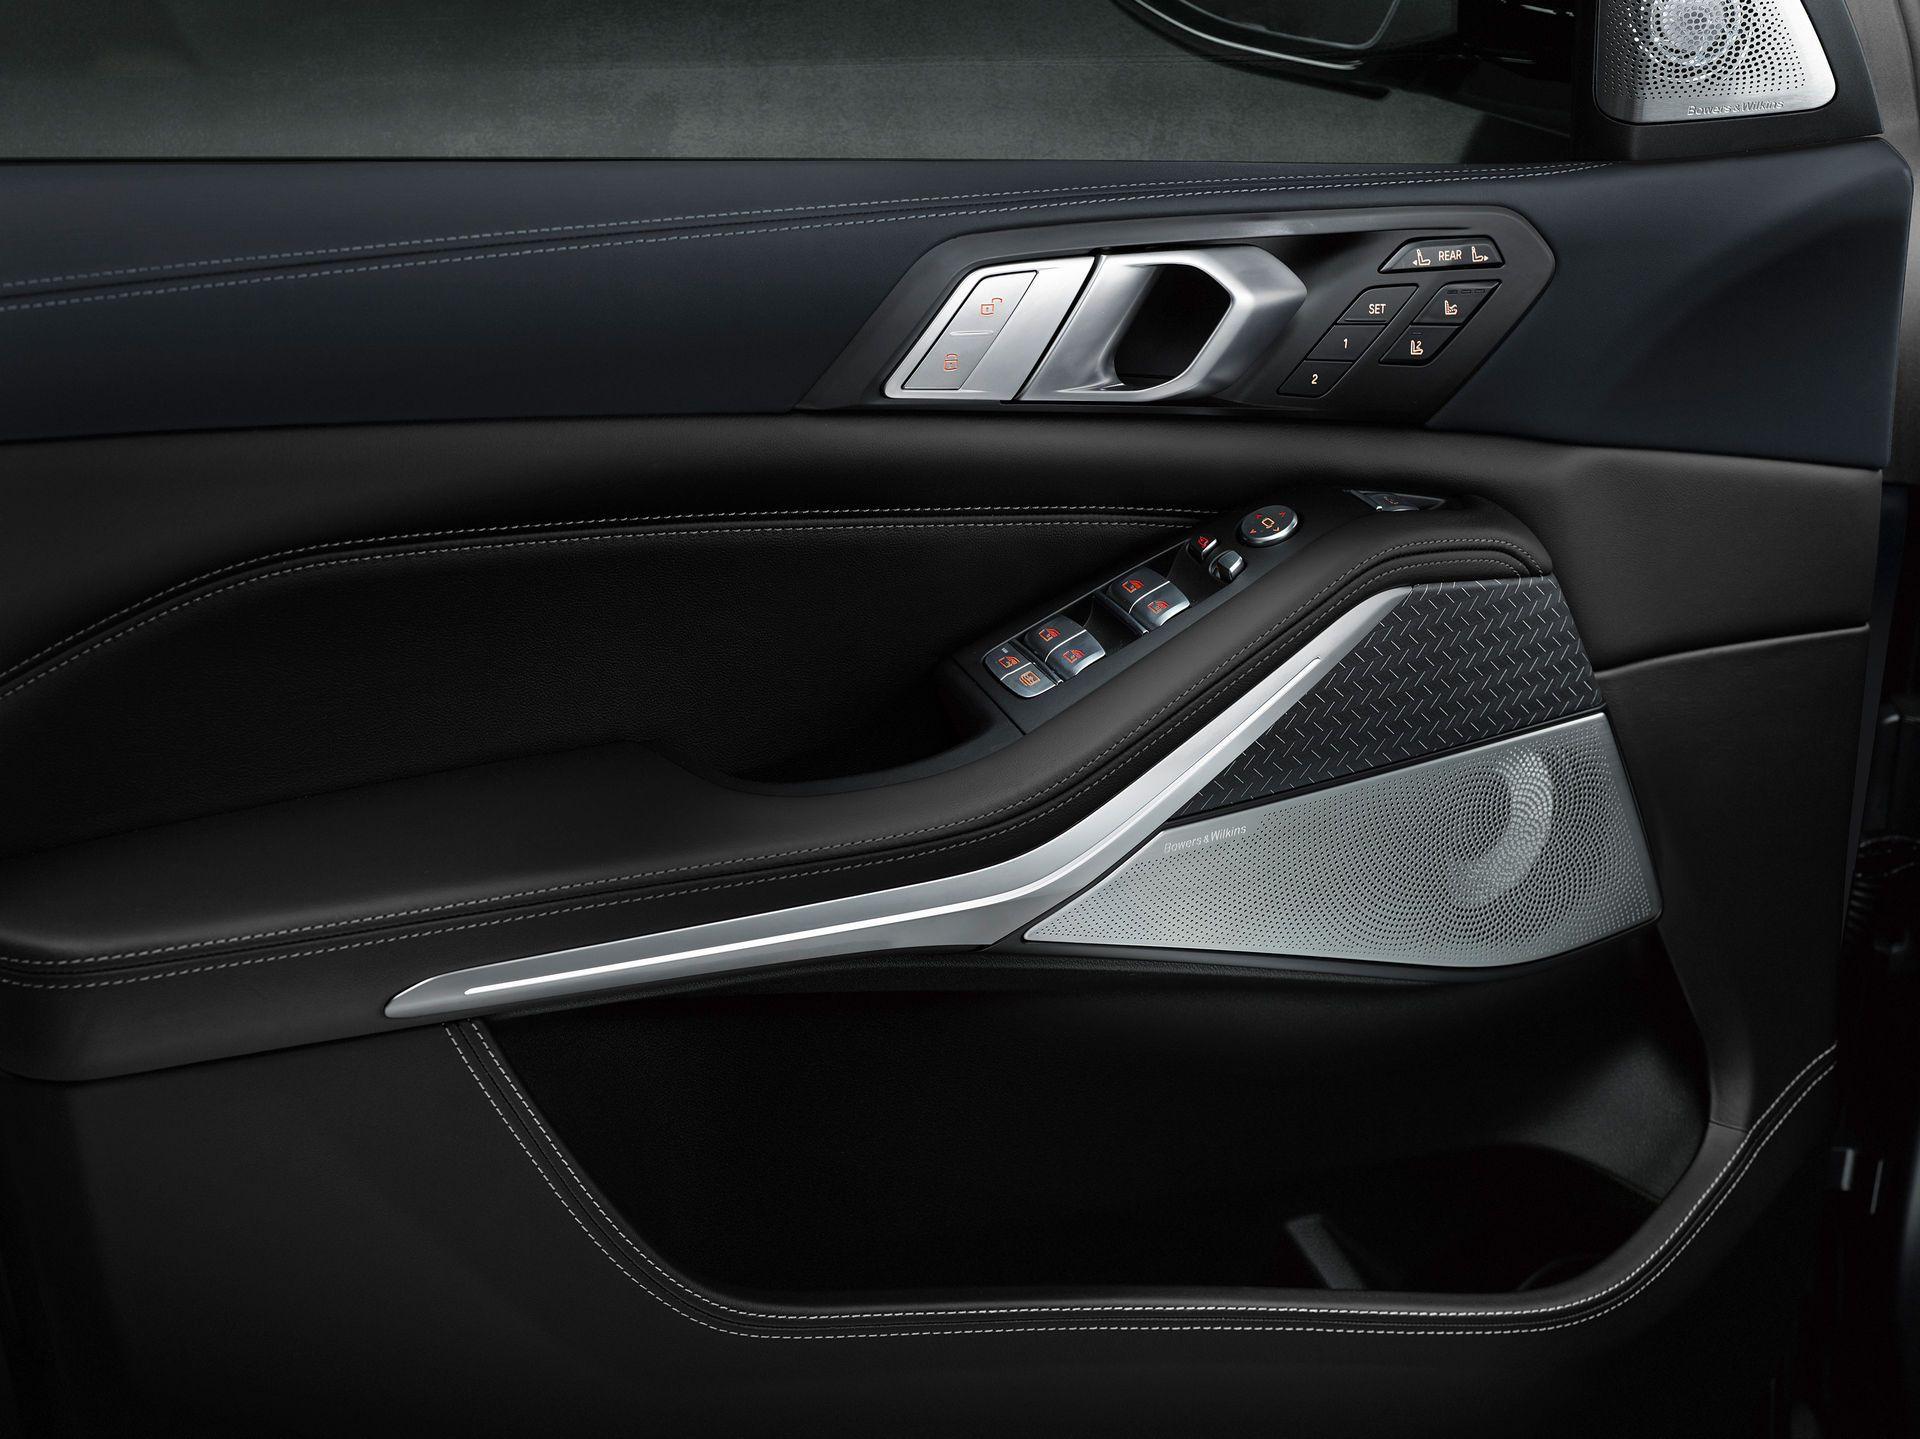 BMW-X7-Dark-Shadow-Edition-18